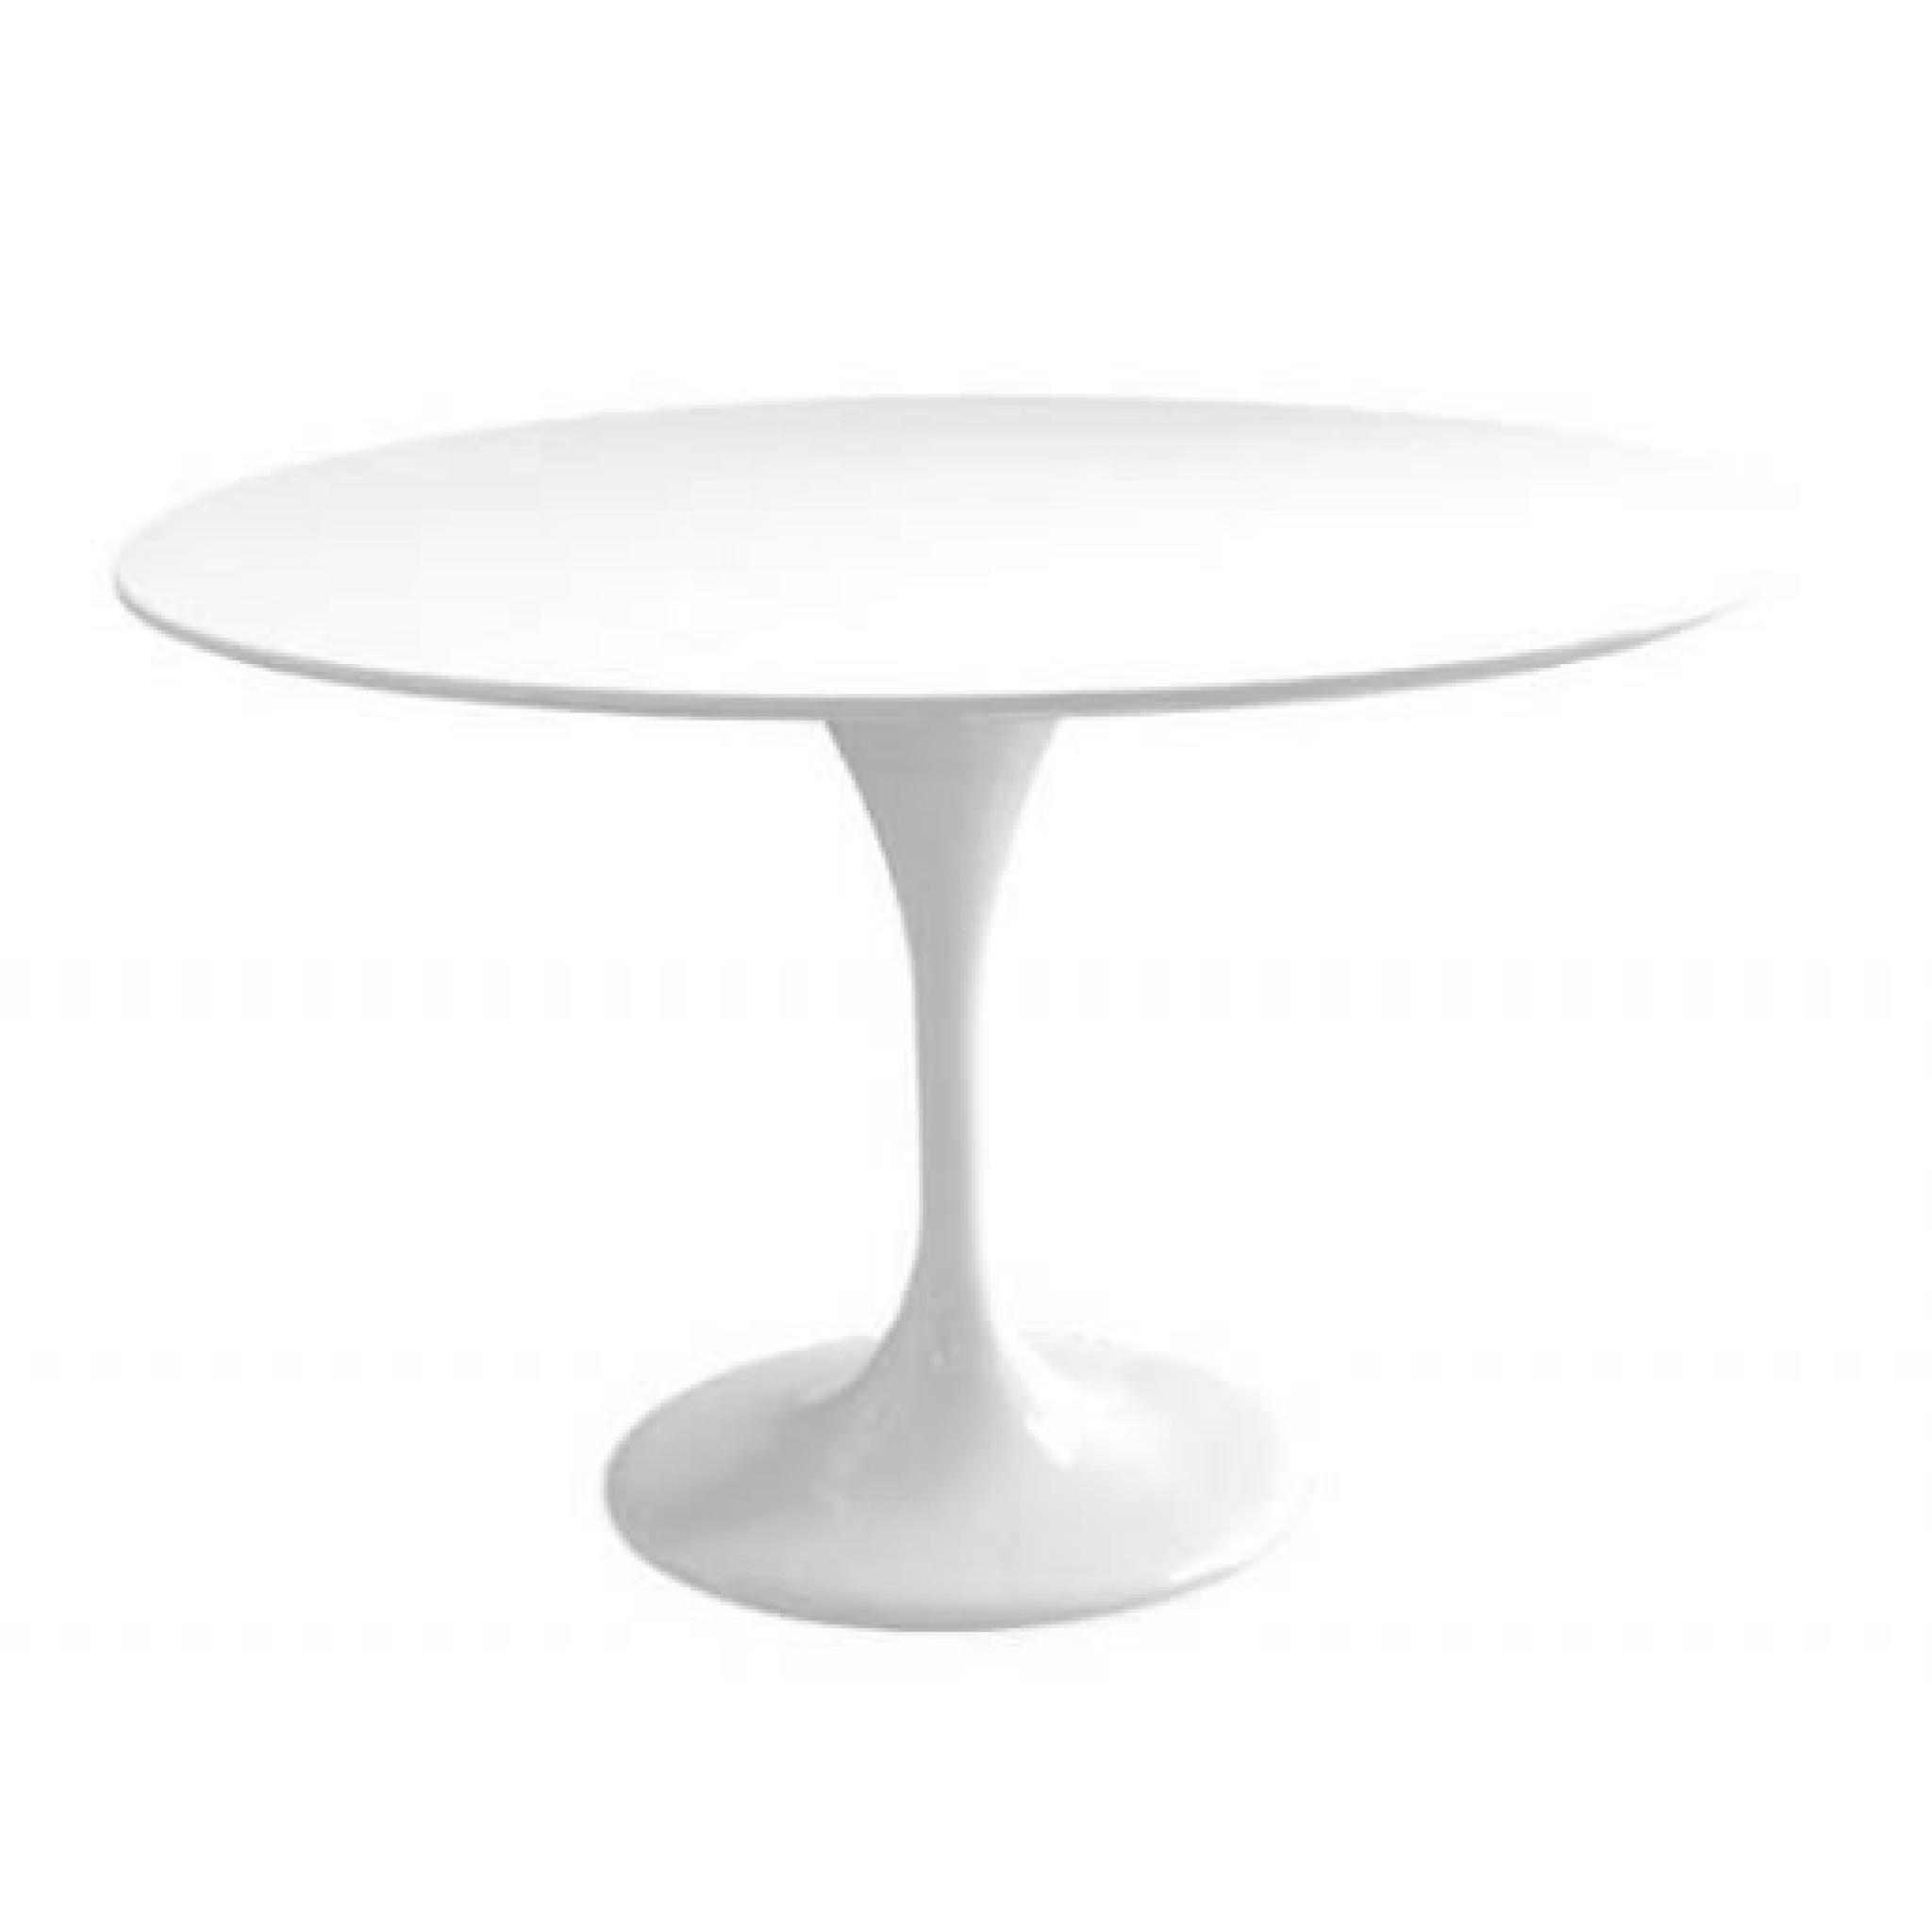 table tulipe 120 cm et 4 chaises fantome blanches achat vente table salle a manger pas cher. Black Bedroom Furniture Sets. Home Design Ideas